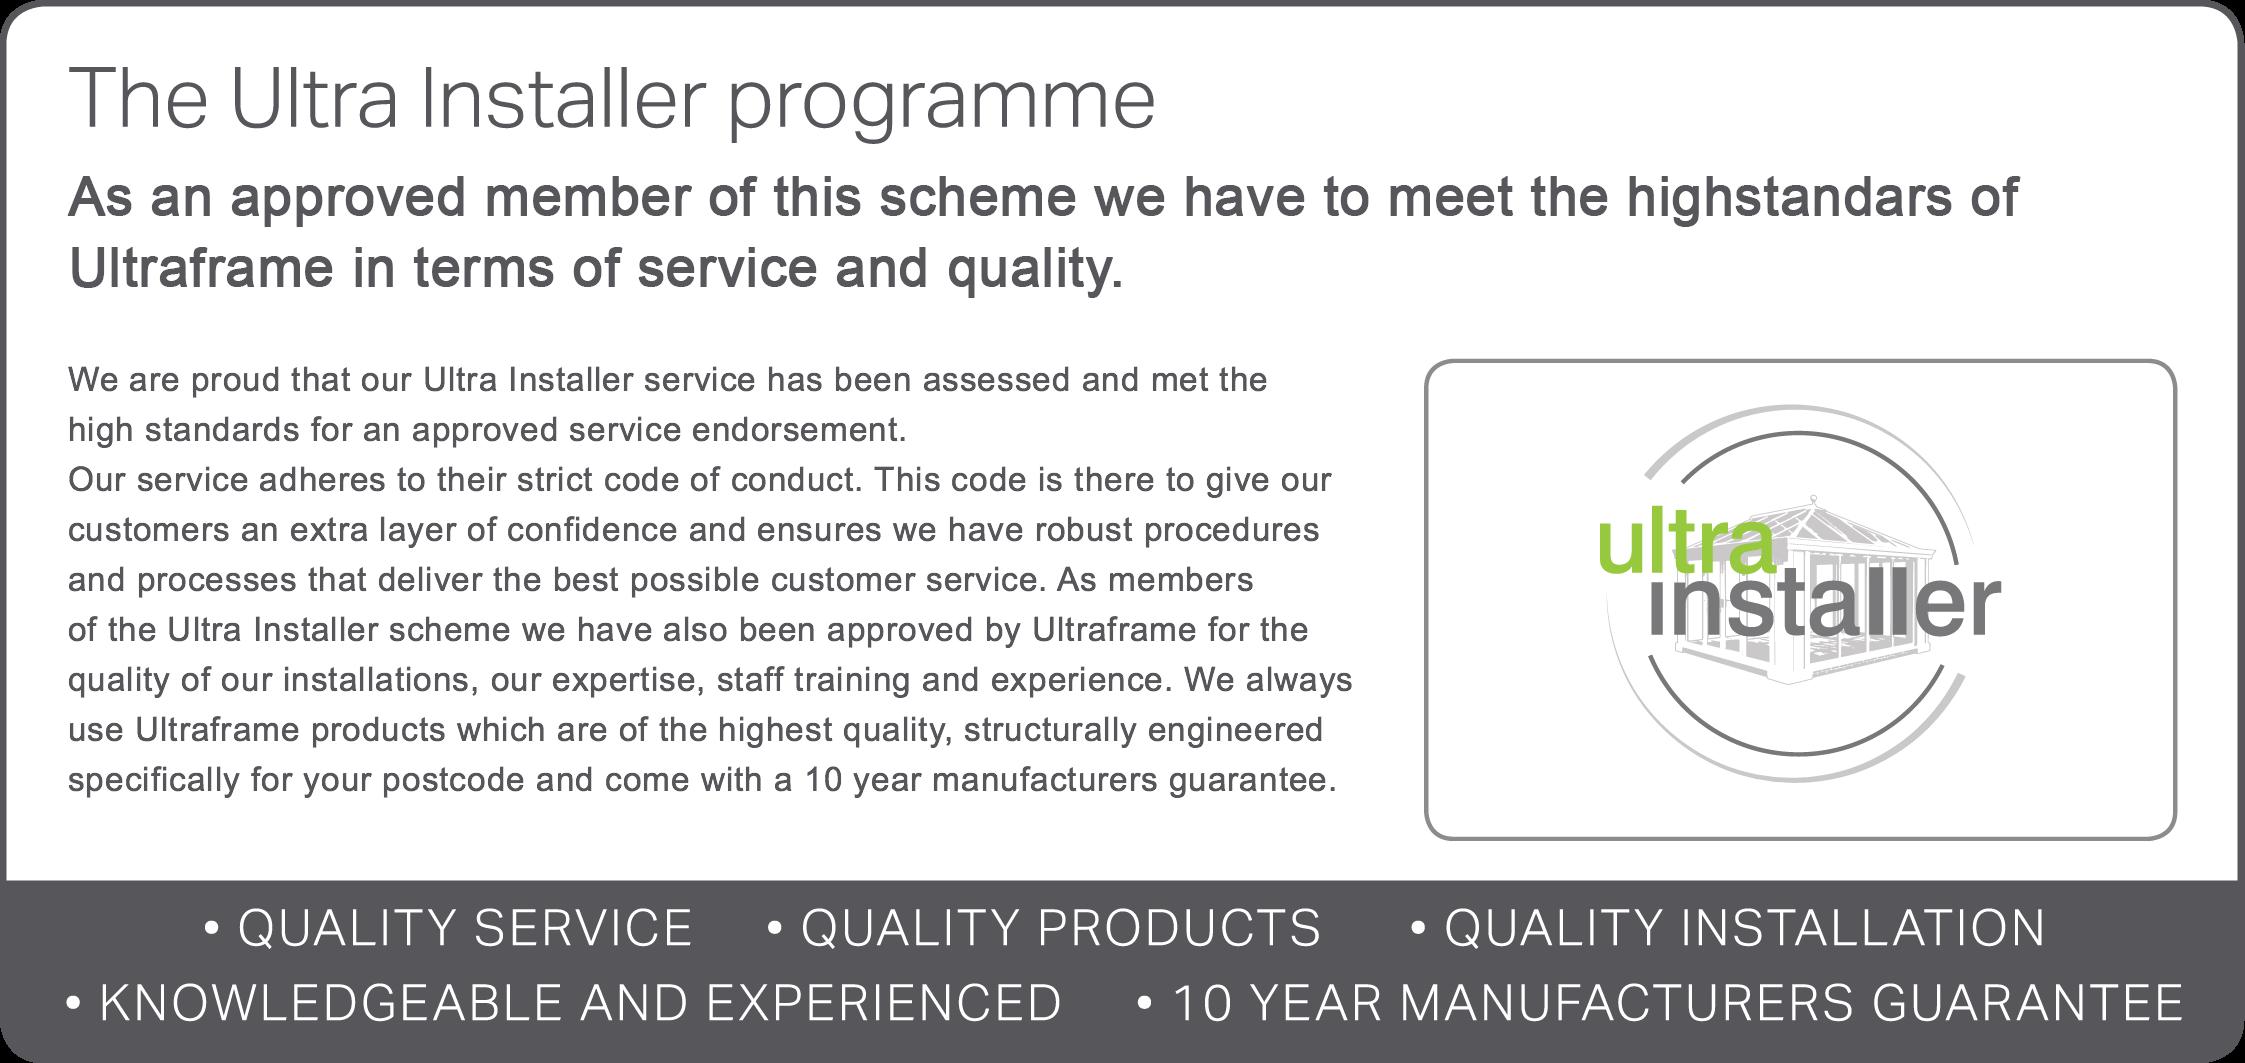 ultrainstallerprogram